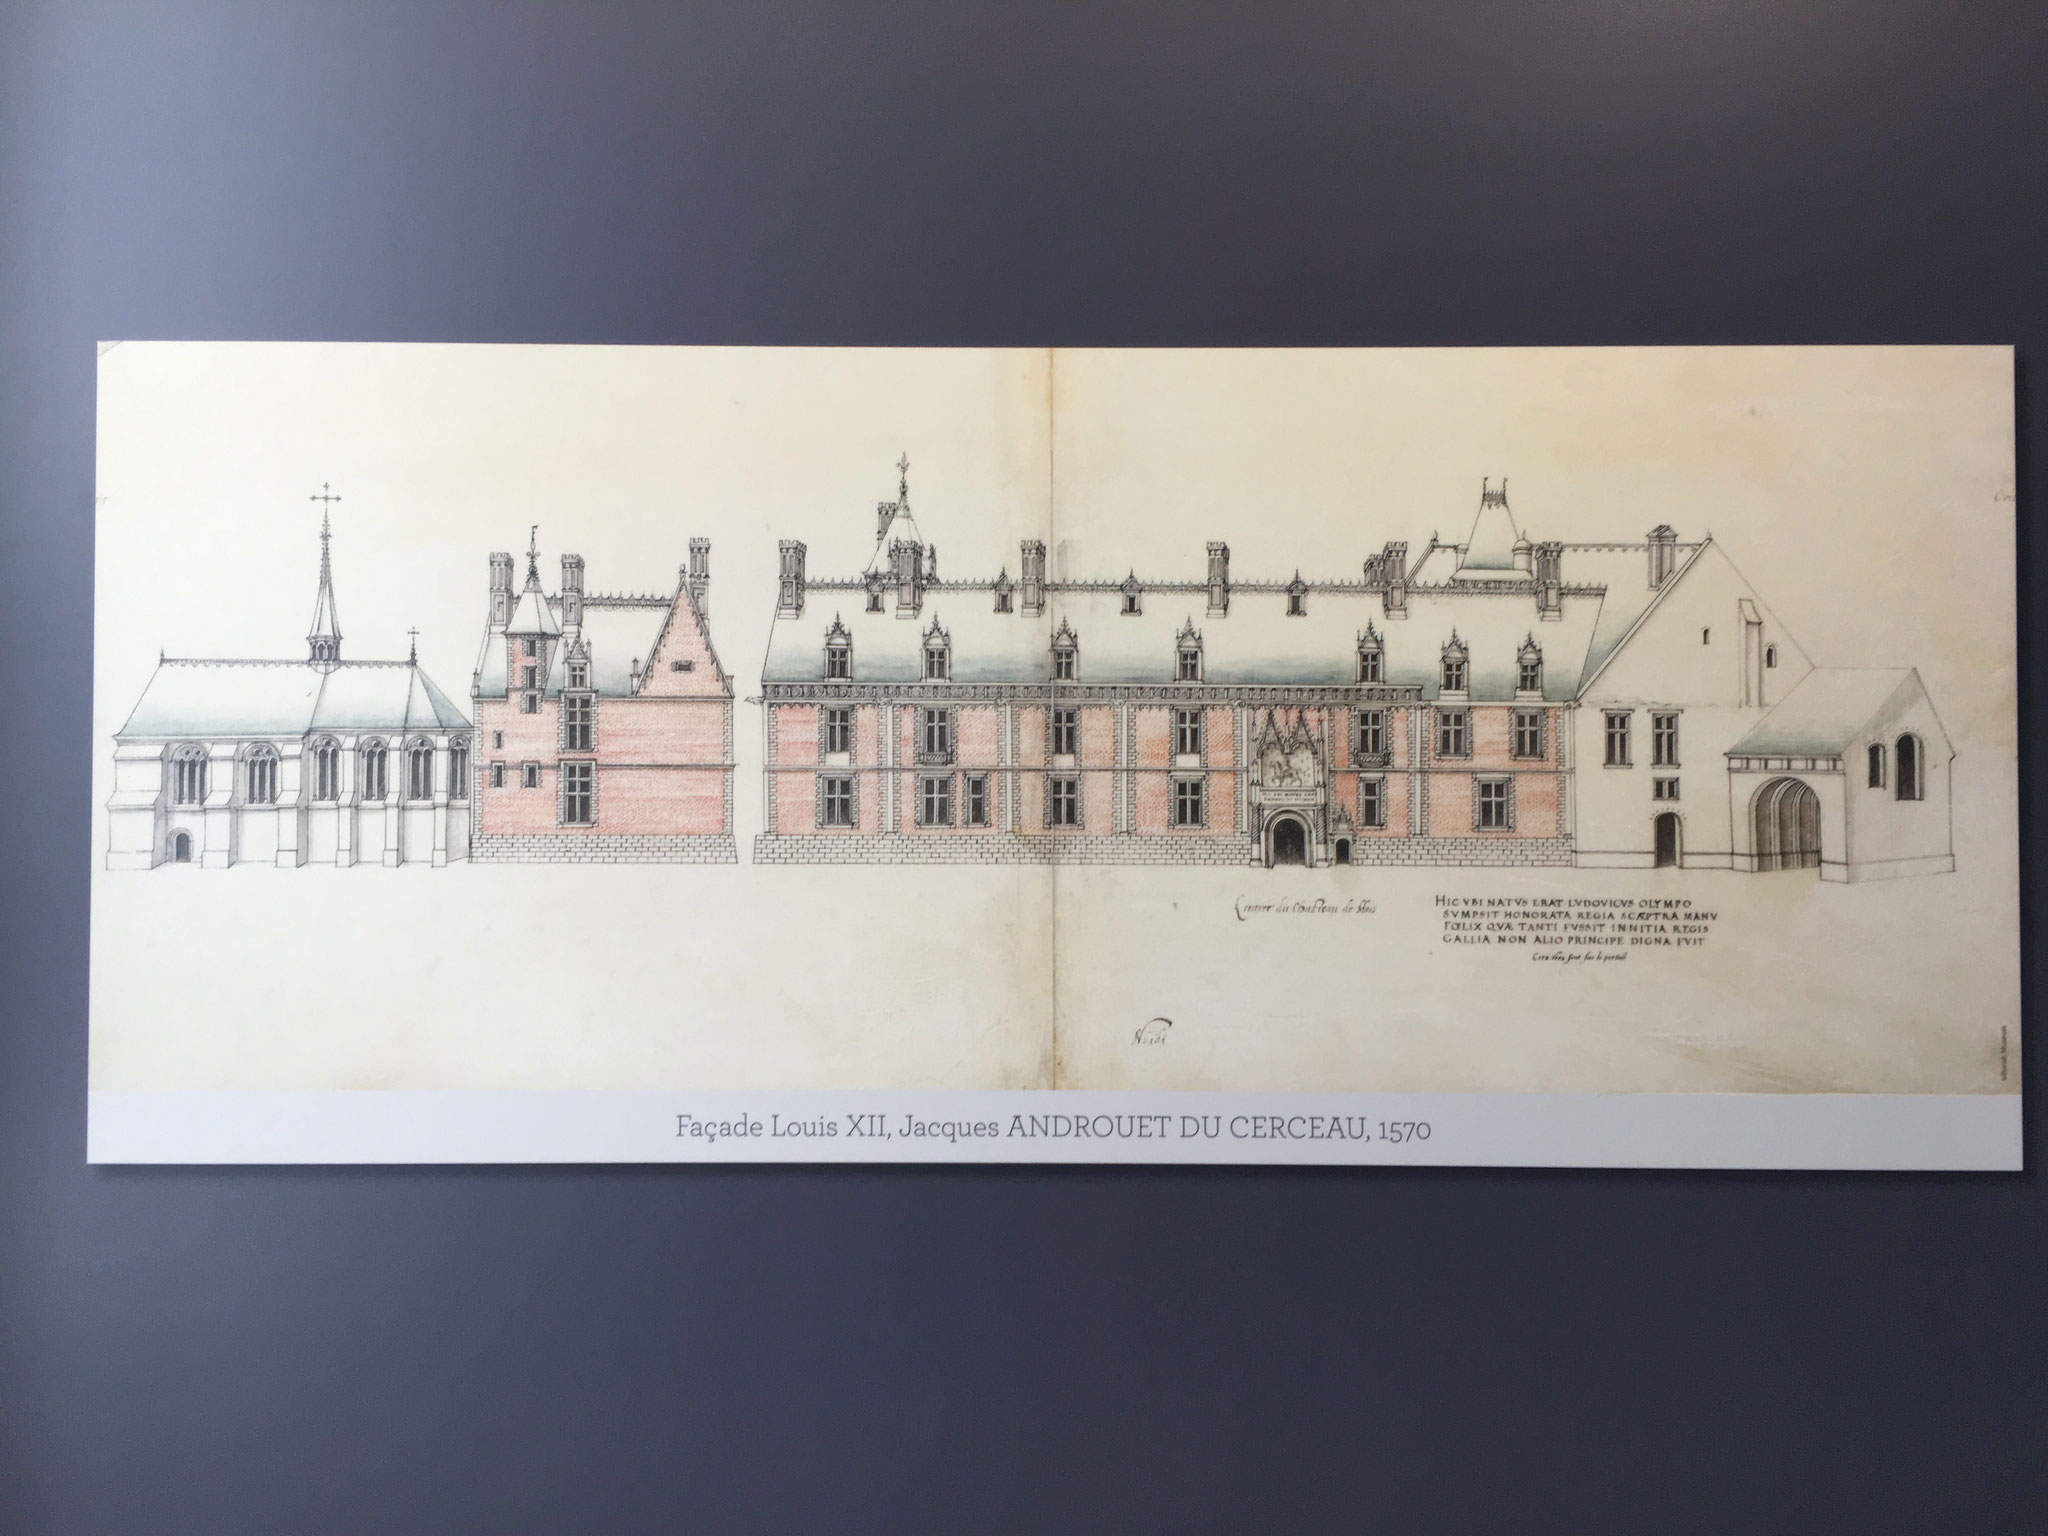 Plan de la façade Louis XII.